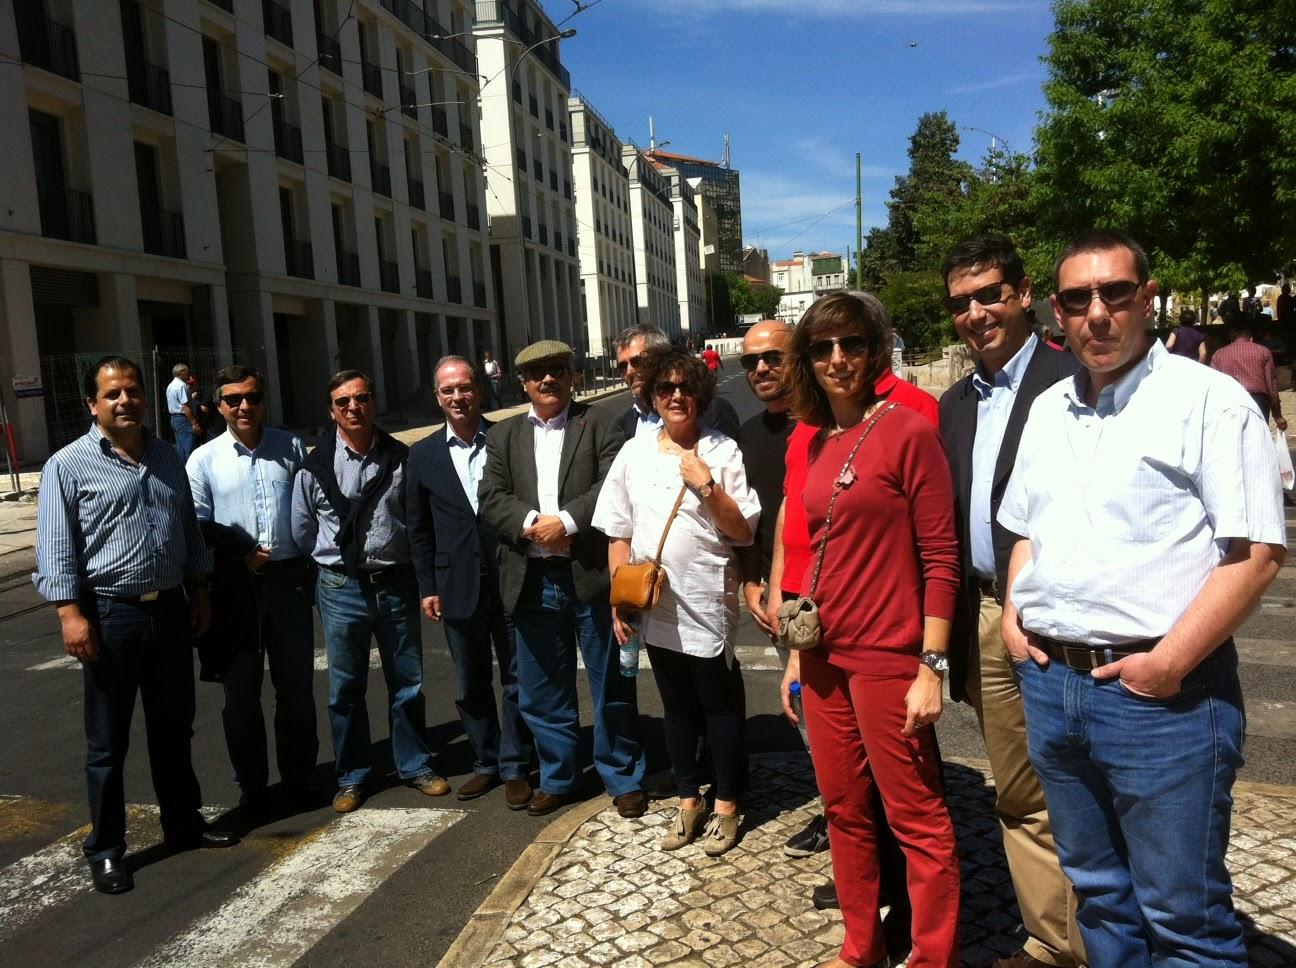 Delegação do Partido Socialista no primeiro Maio da CGTP-IN e vários sindicalistas socialistas da CGTP-IN